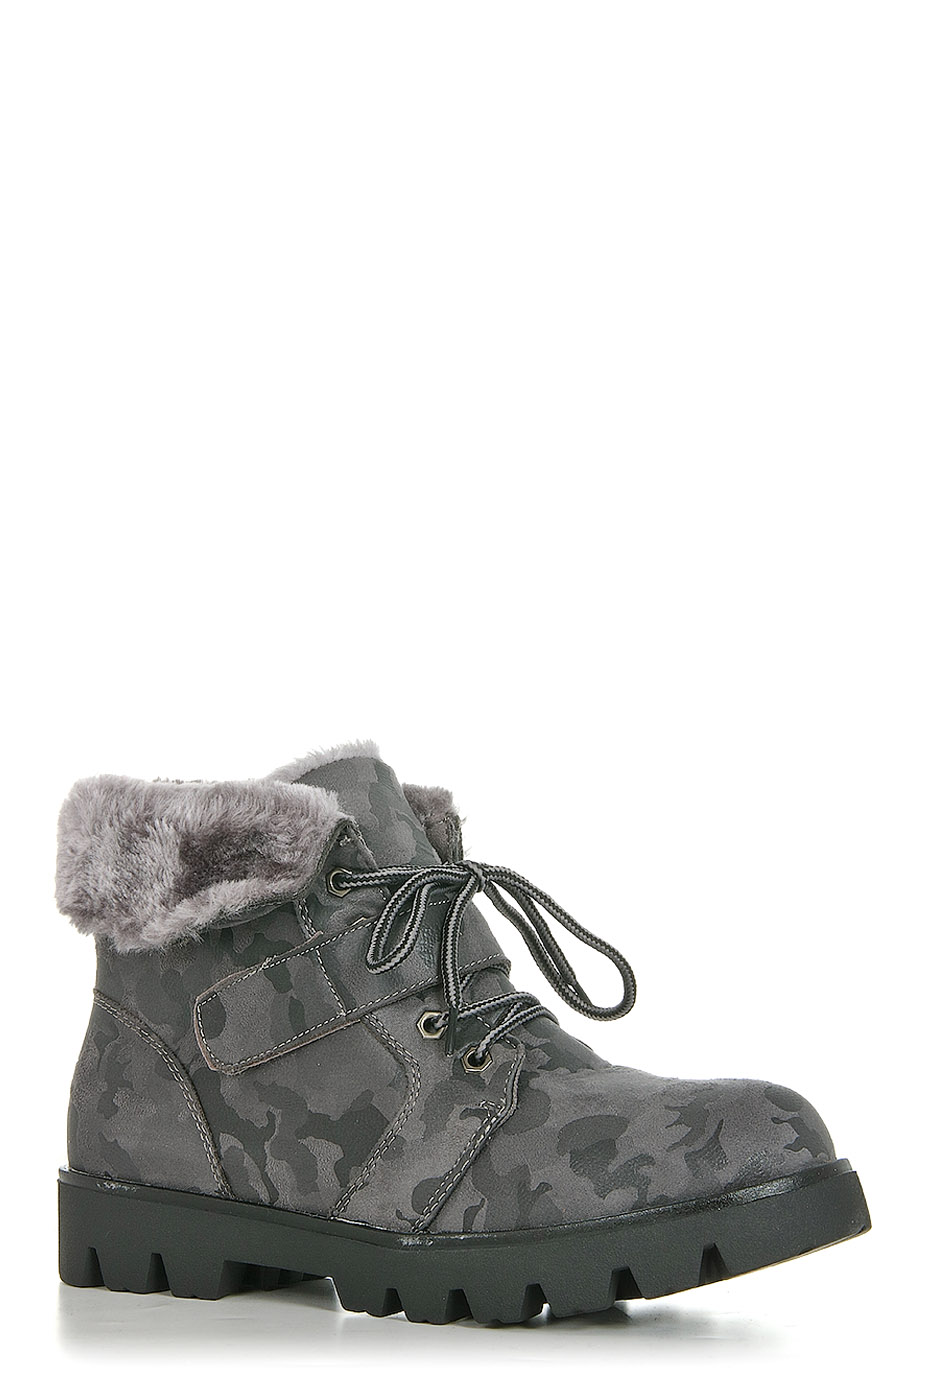 Ботинки TOPLAND2322-PB76150C/GREY